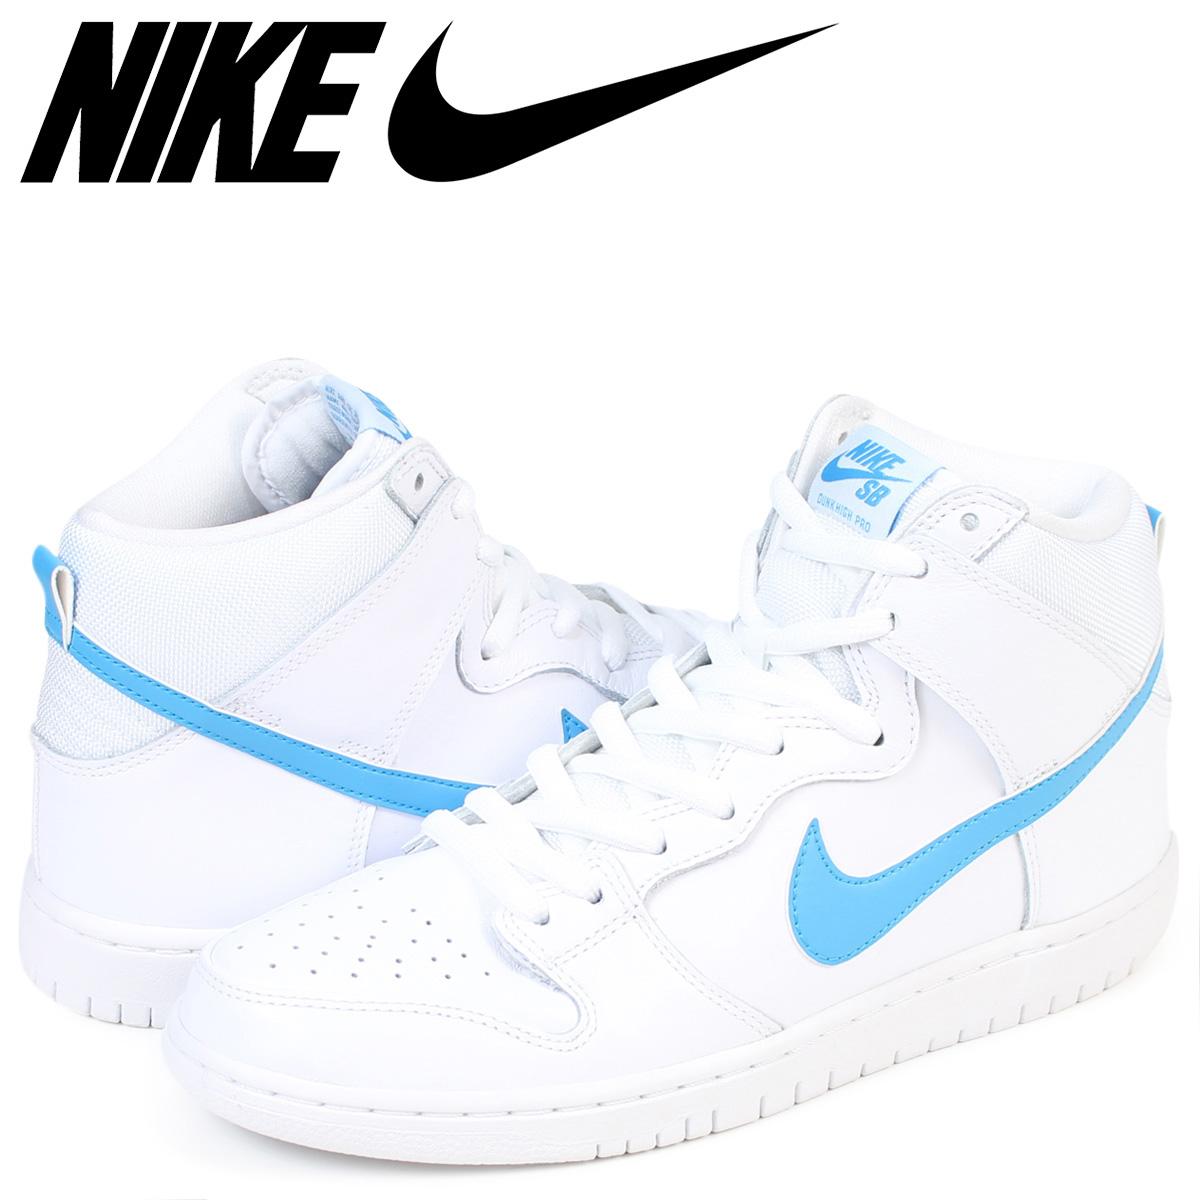 quality design f5cca acc45 Nike NIKE SB dunk high sneakers DUNK HIGH TRD QS MULDER 881,758-141 men s  shoes white  9 6 Shinnyu load